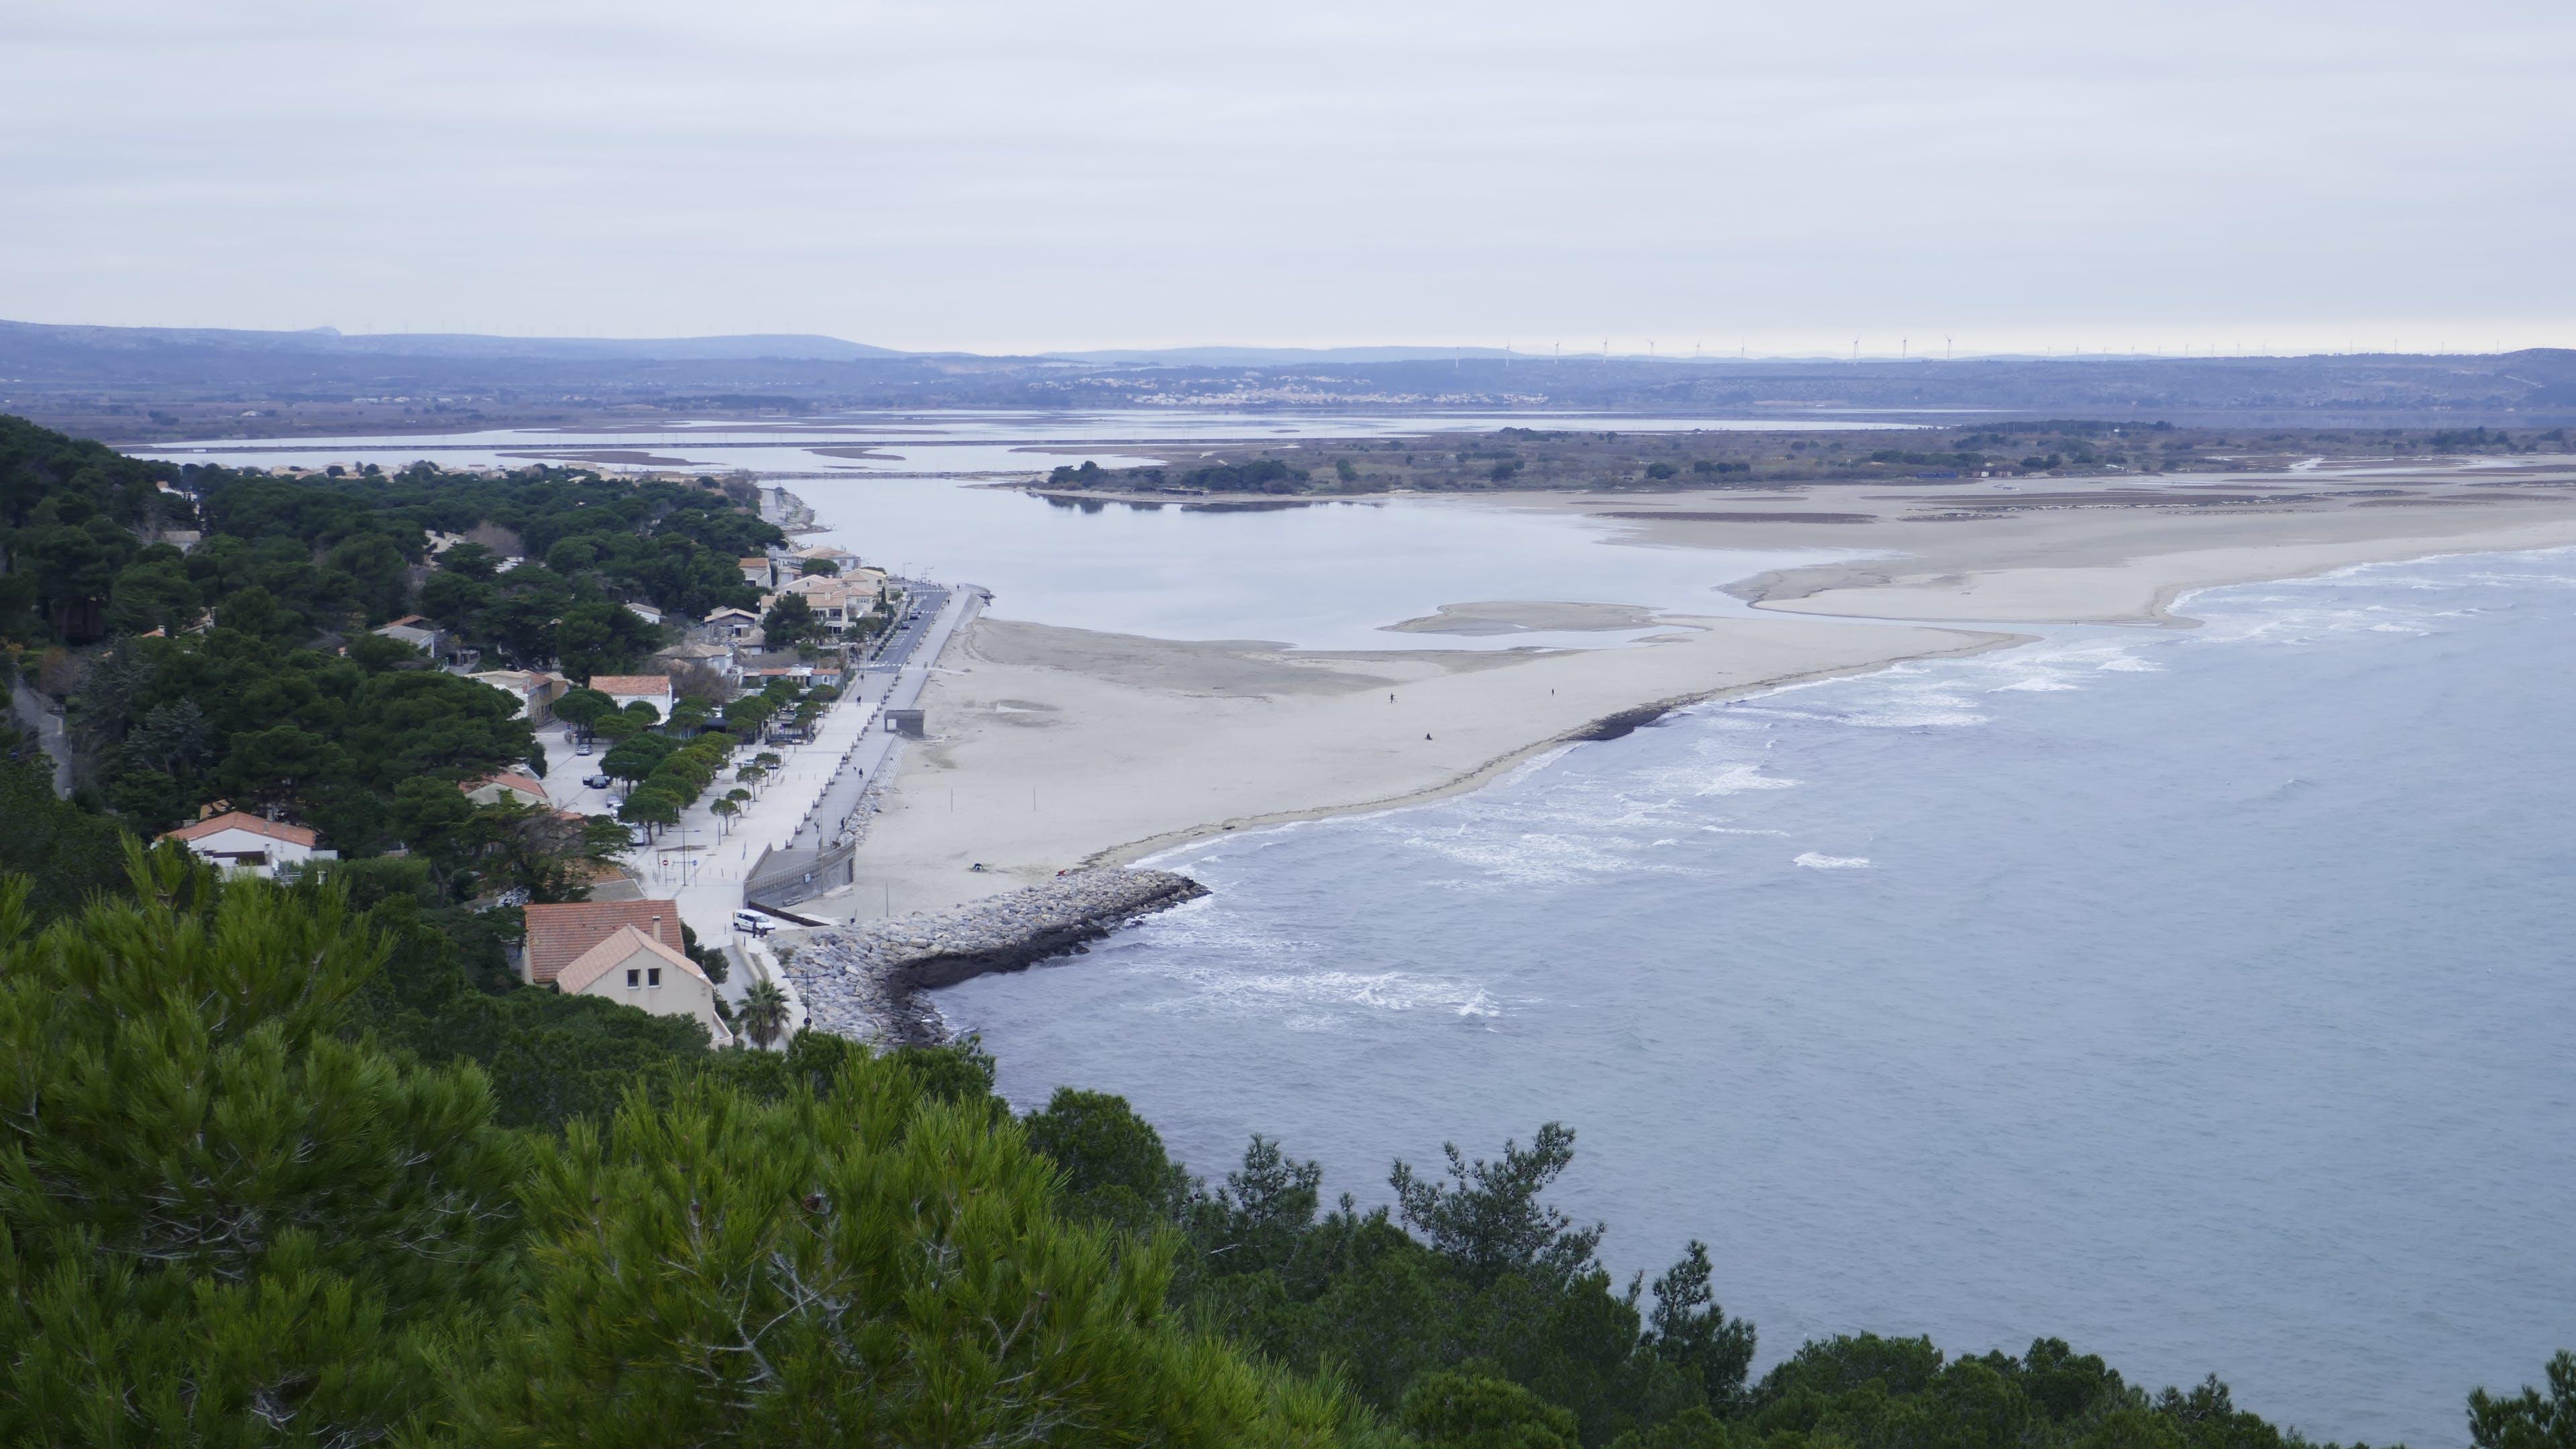 Free stock photo of by the sea, deserted beach, mediterranean sea, seaside